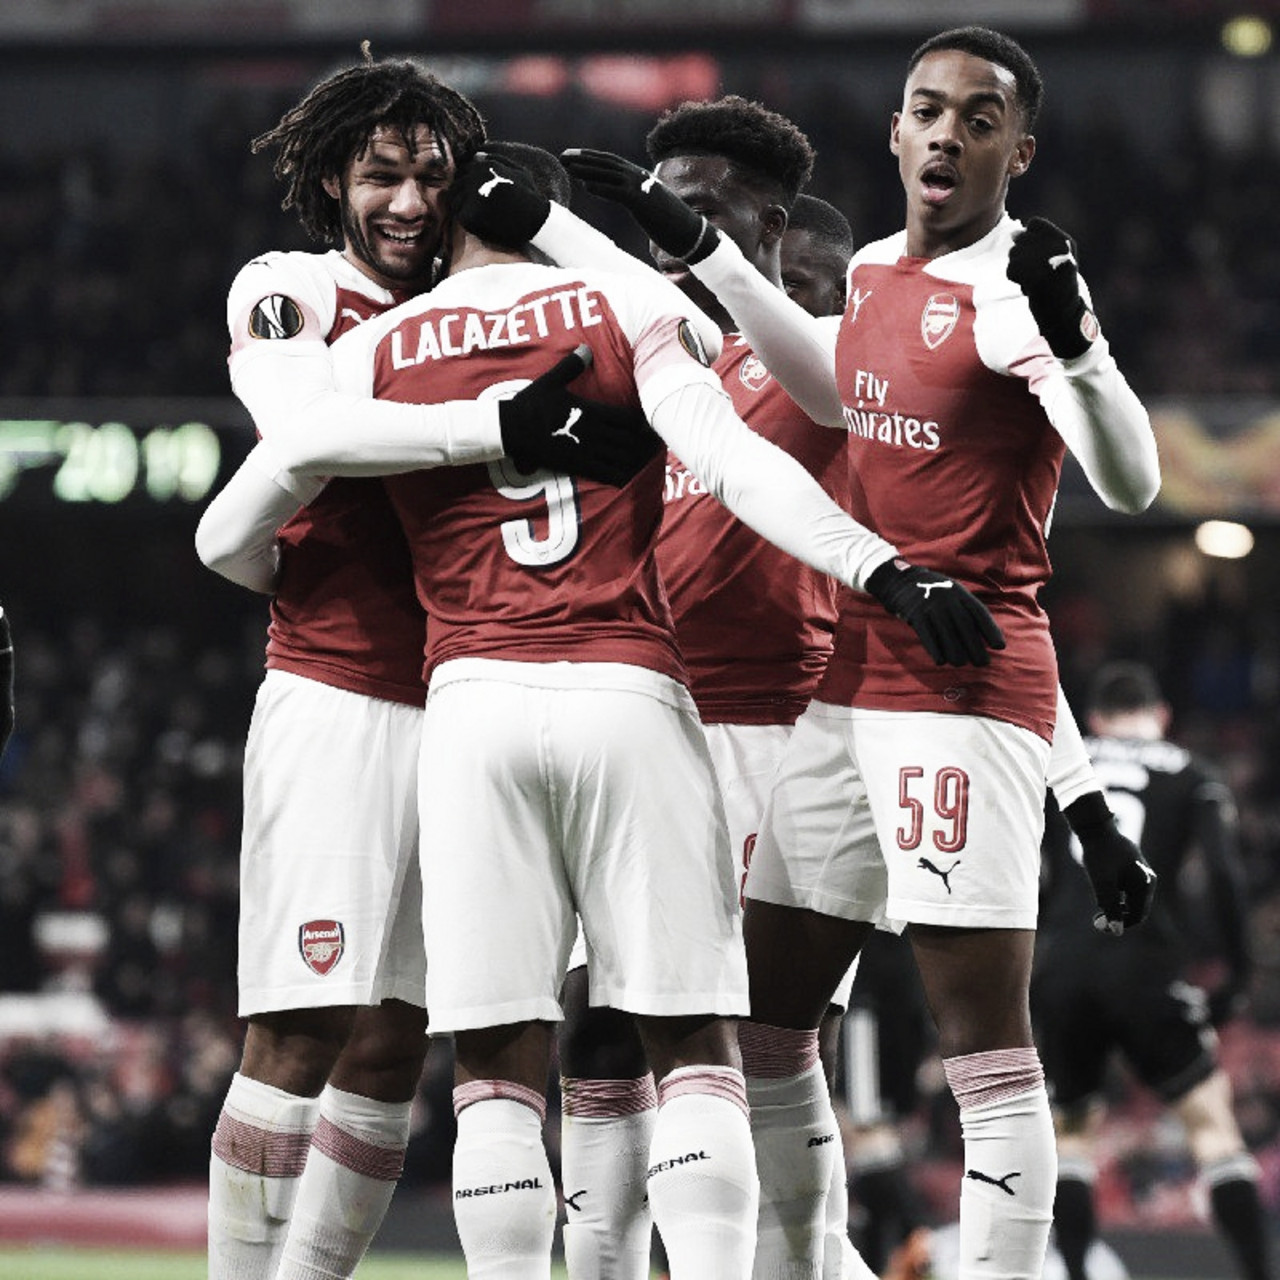 Lacazette marca e Arsenal derrota Qarabag pela última rodada da Europa League